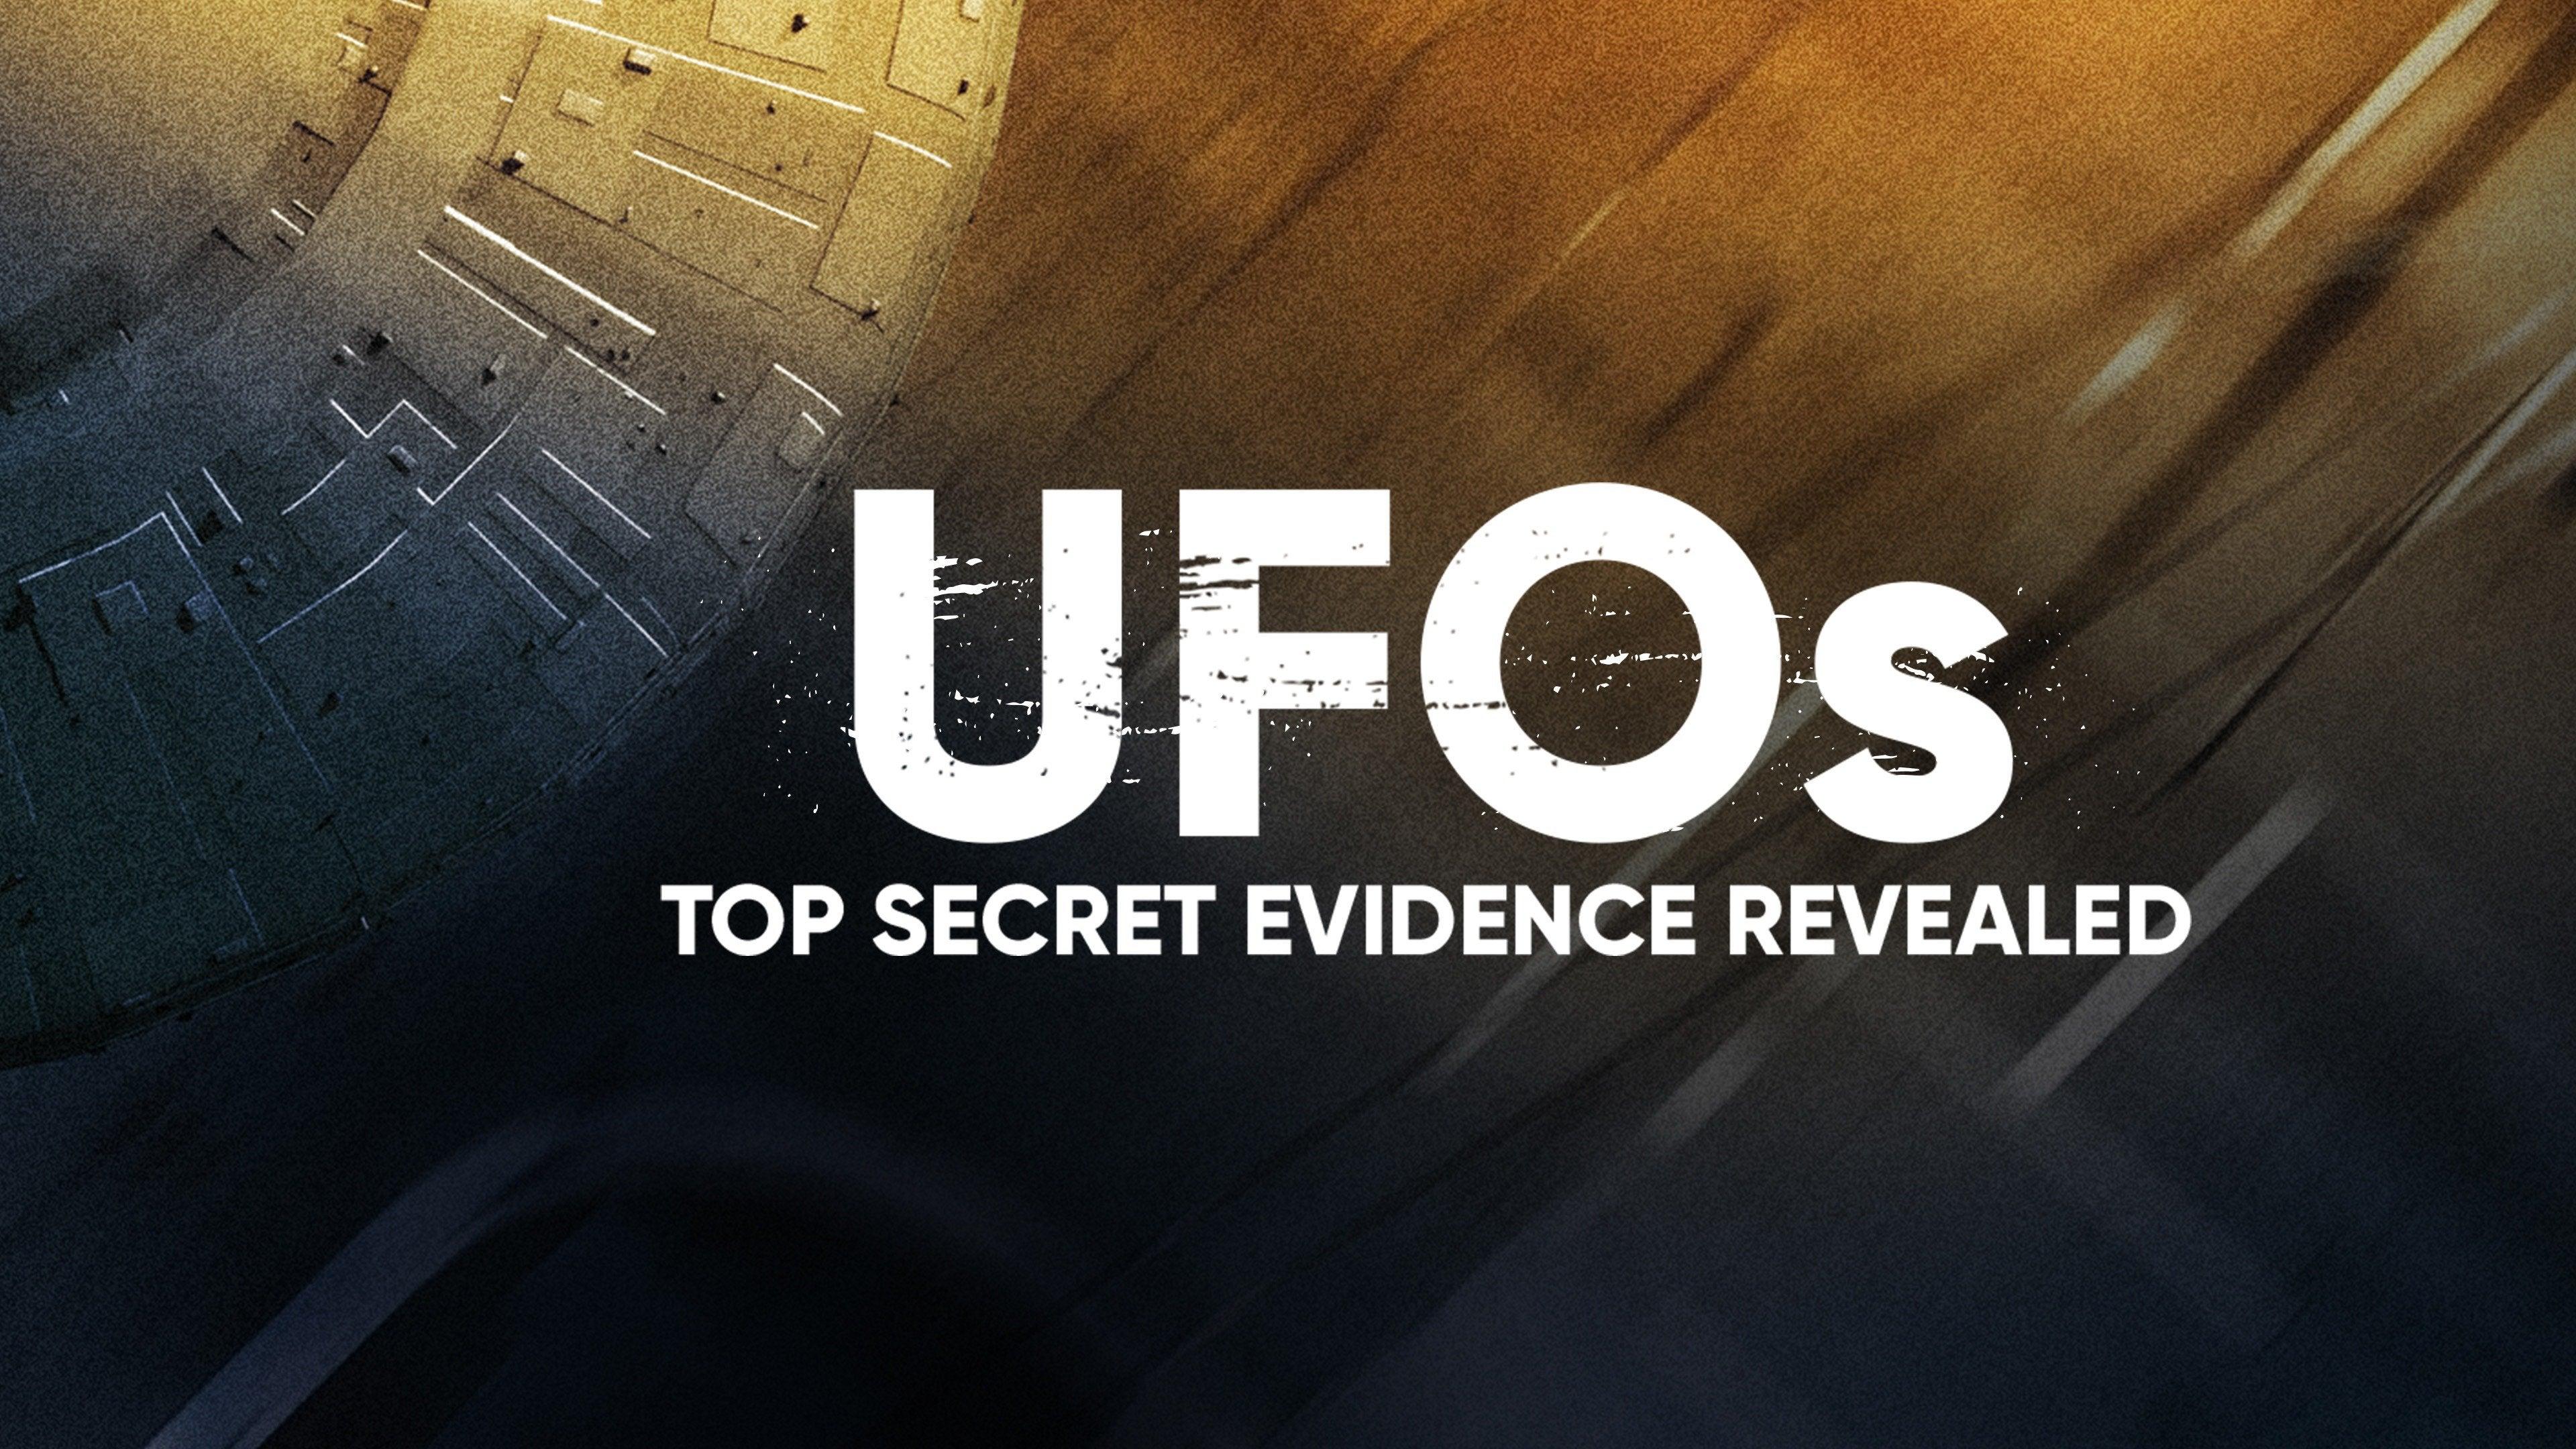 UFOs: Top Secret Evidence Revealed